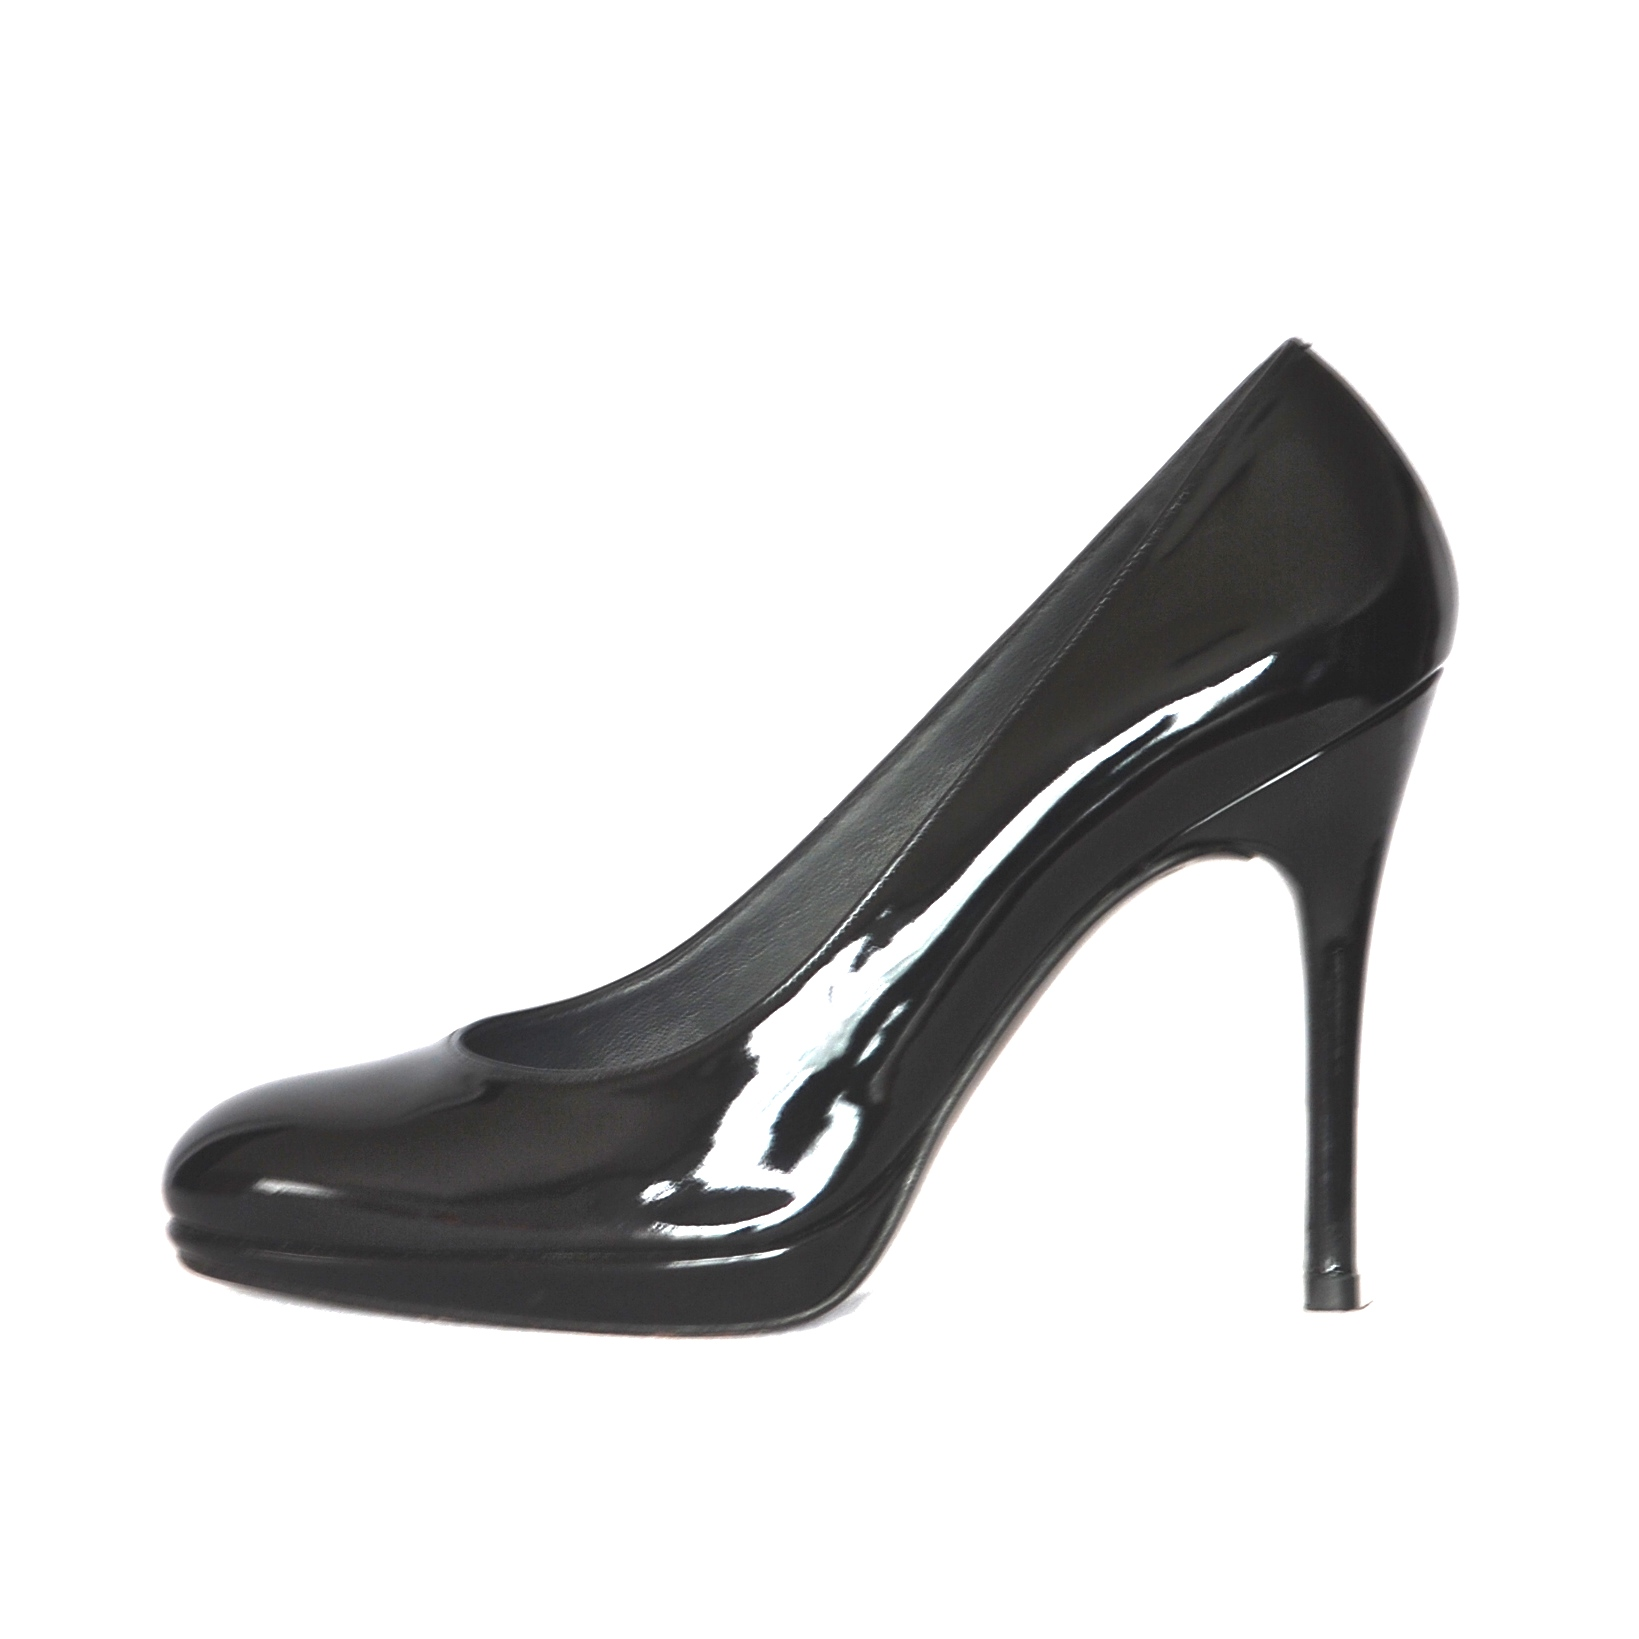 9ec31cb59 Stuart Weitzman Classic Black Patent Leather High Heel Pumps – Spain ...